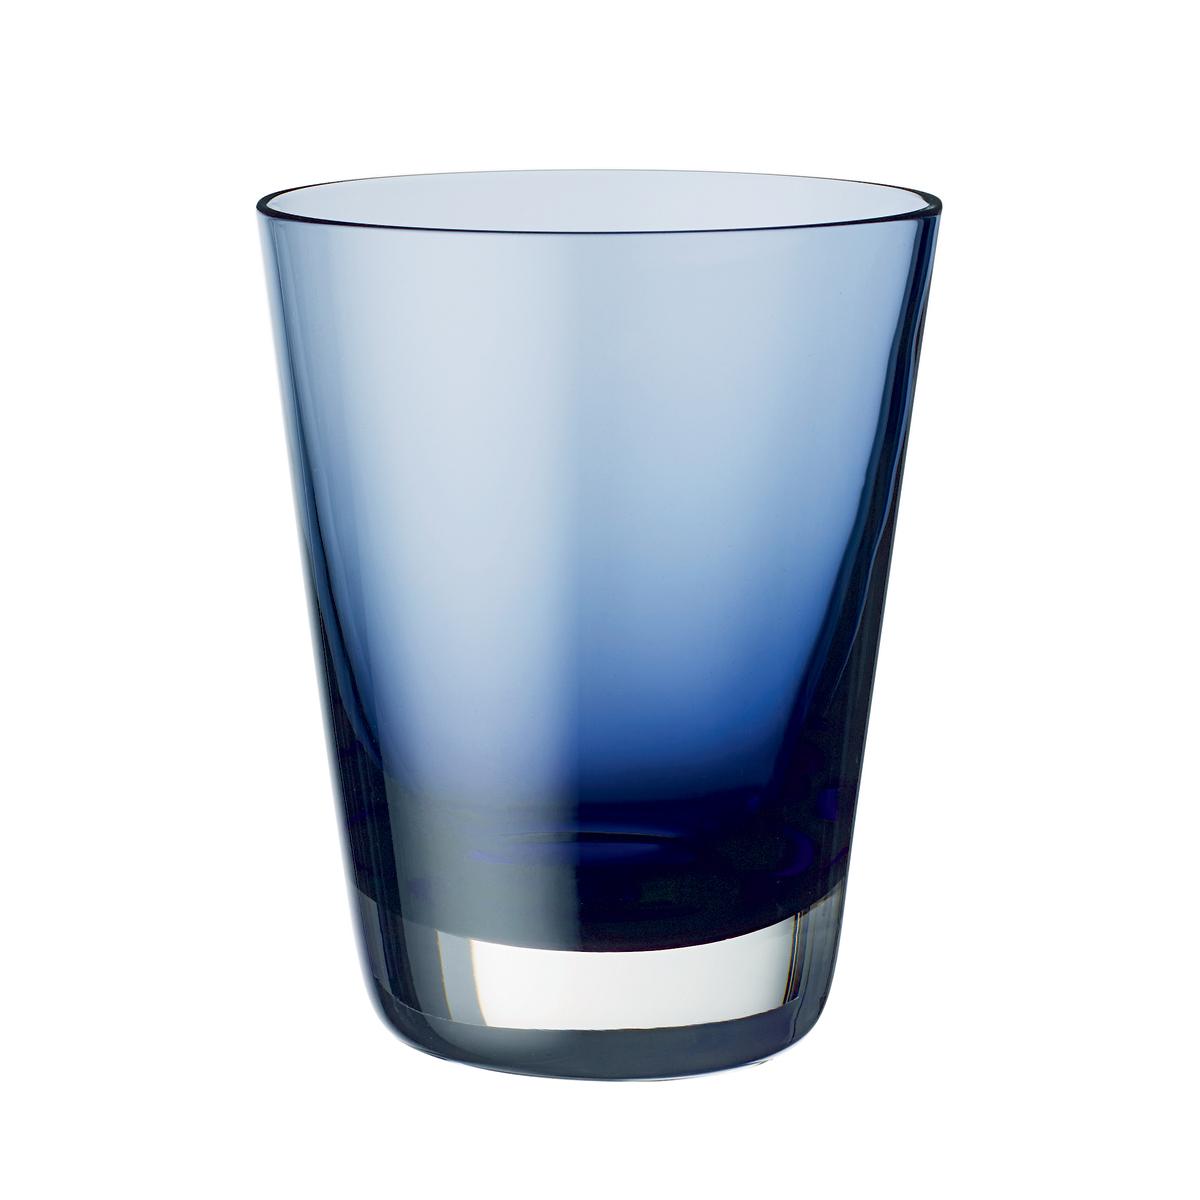 Villeroy and Boch Colour Concept DOF, Tumbler Midnight Blue, Single